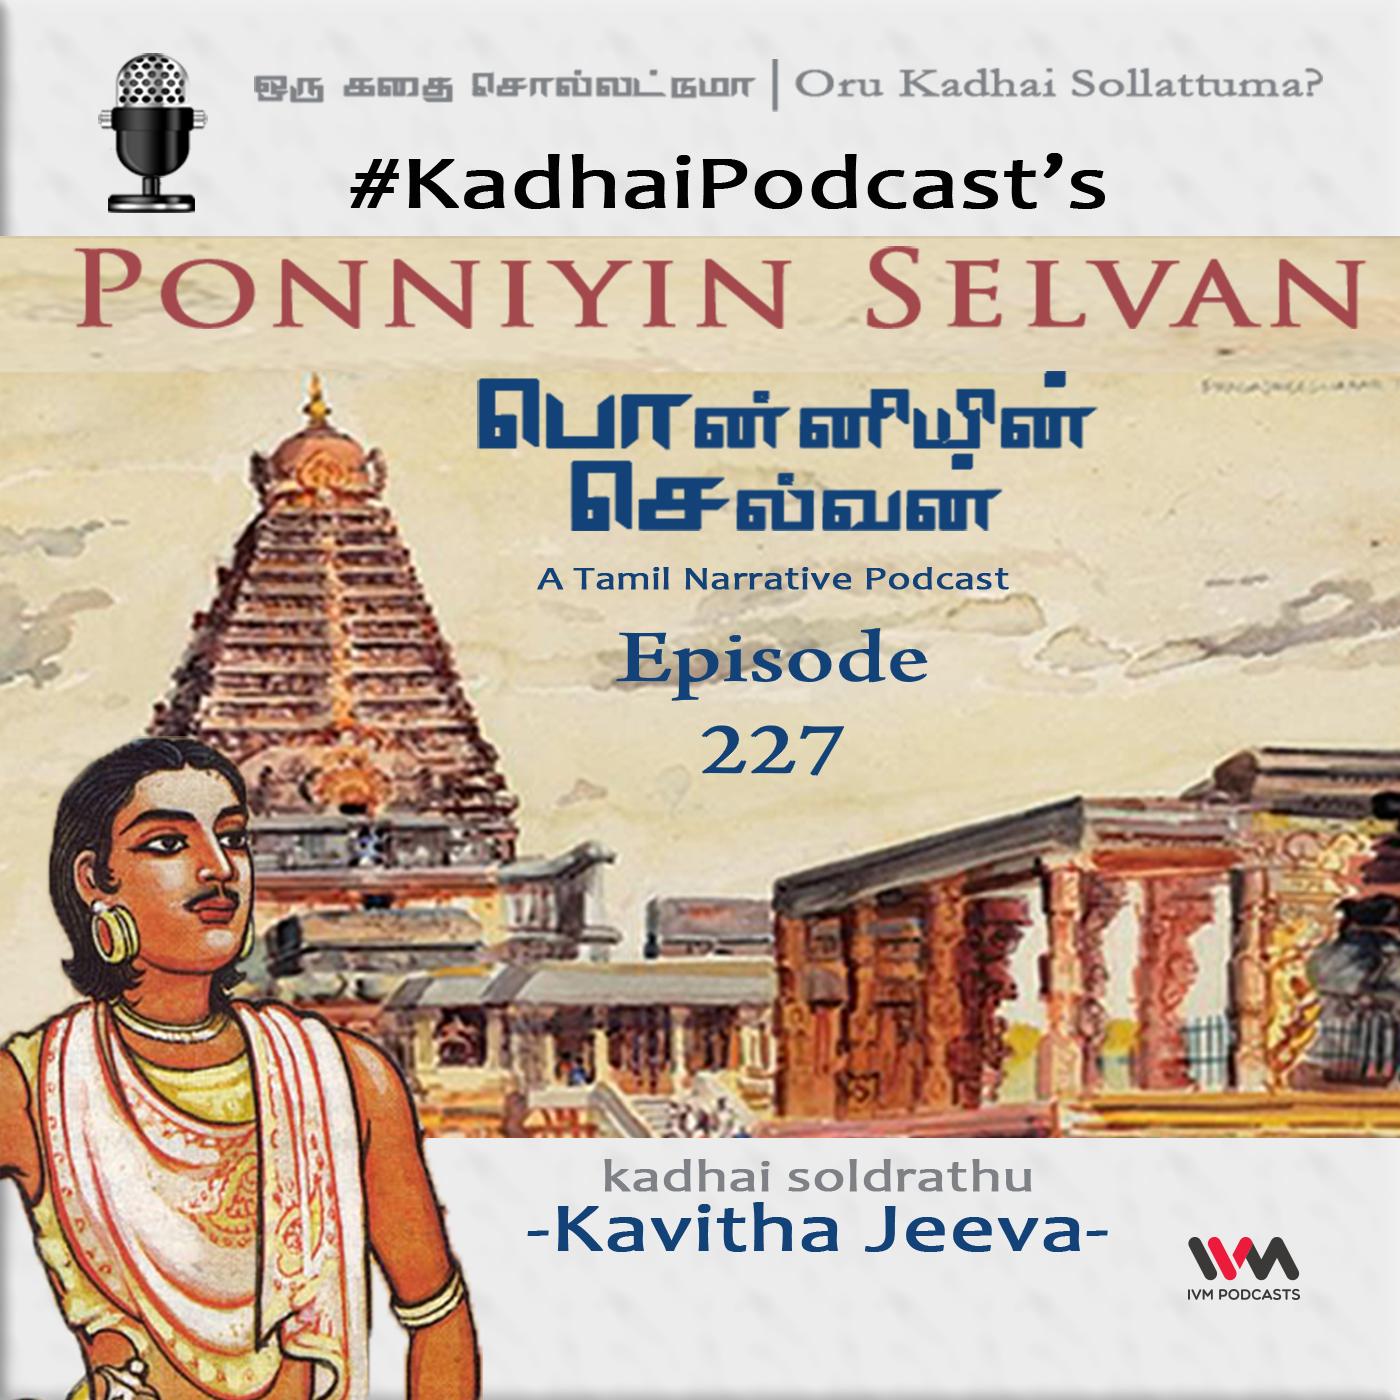 KadhaiPodcast's Ponniyin Selvan - Episode # 227